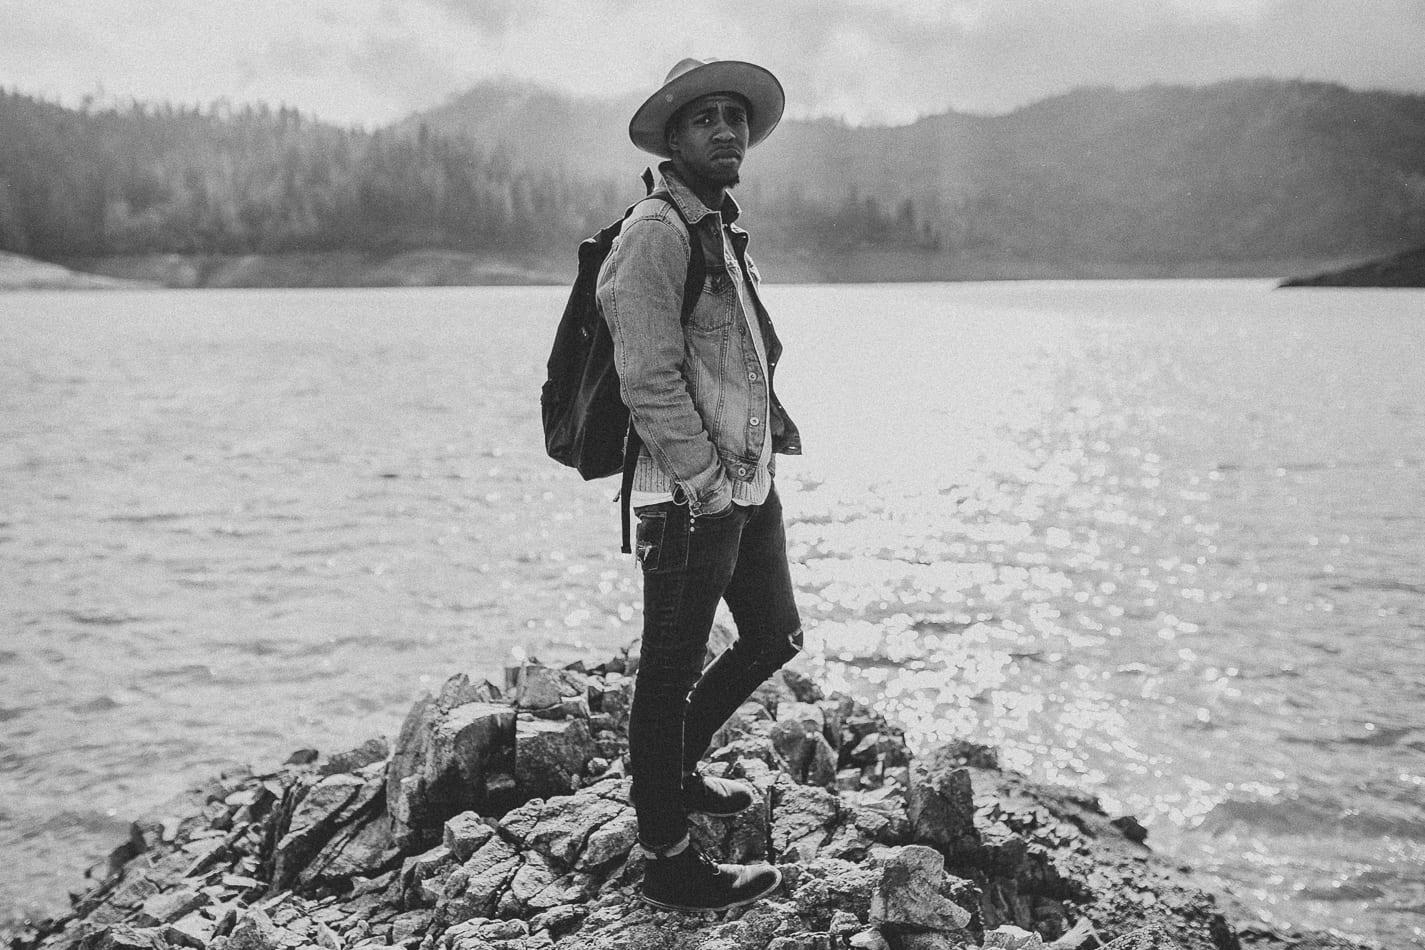 shasta-lake-redding-california-lifestyle-portrait-photographer-11